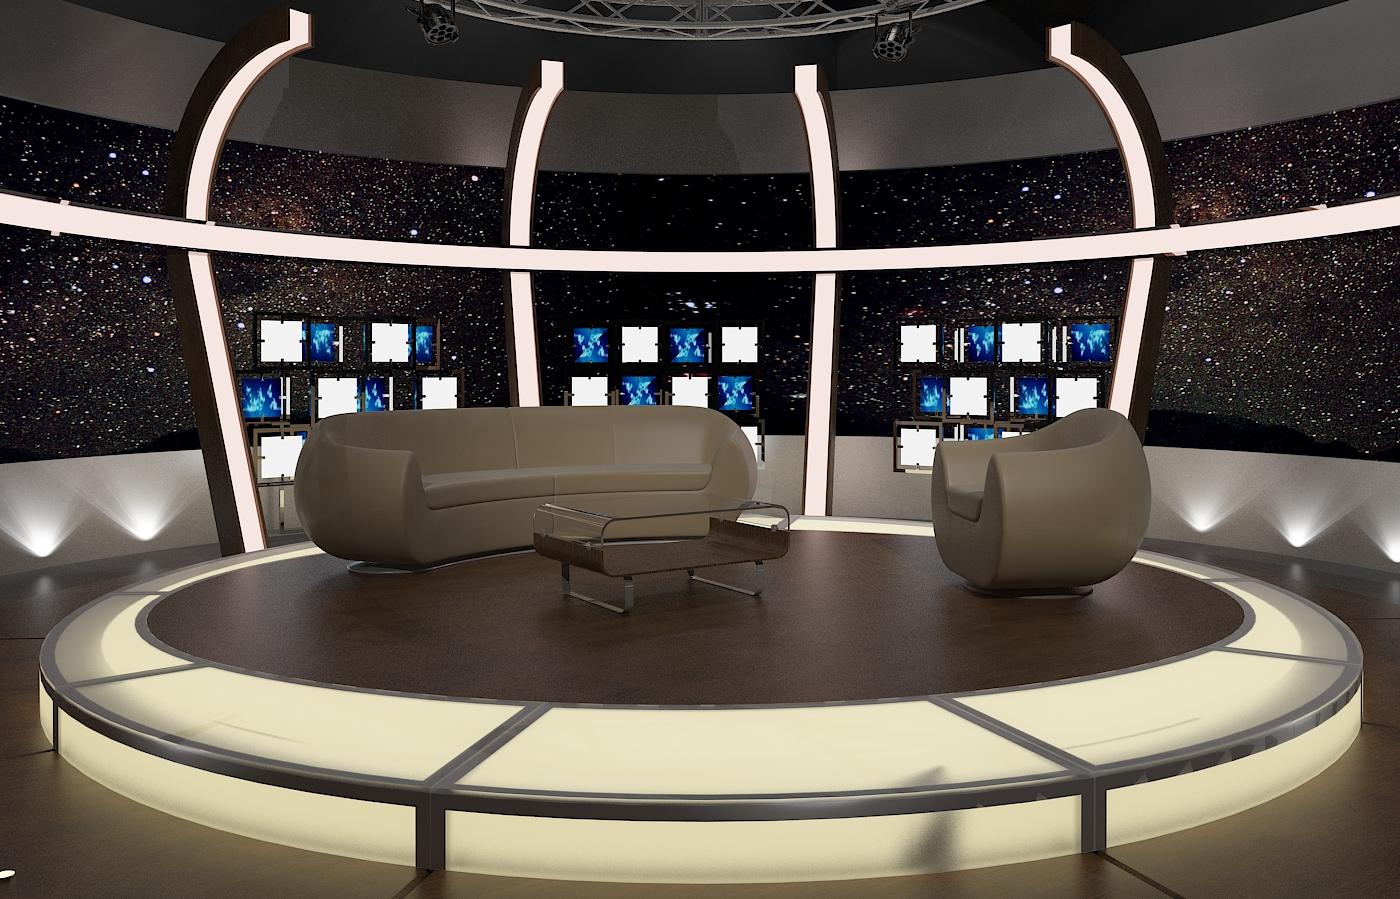 tv studio furniture.  Studio 3d Virtual TV Studio Chat Set 20 To Tv Furniture A